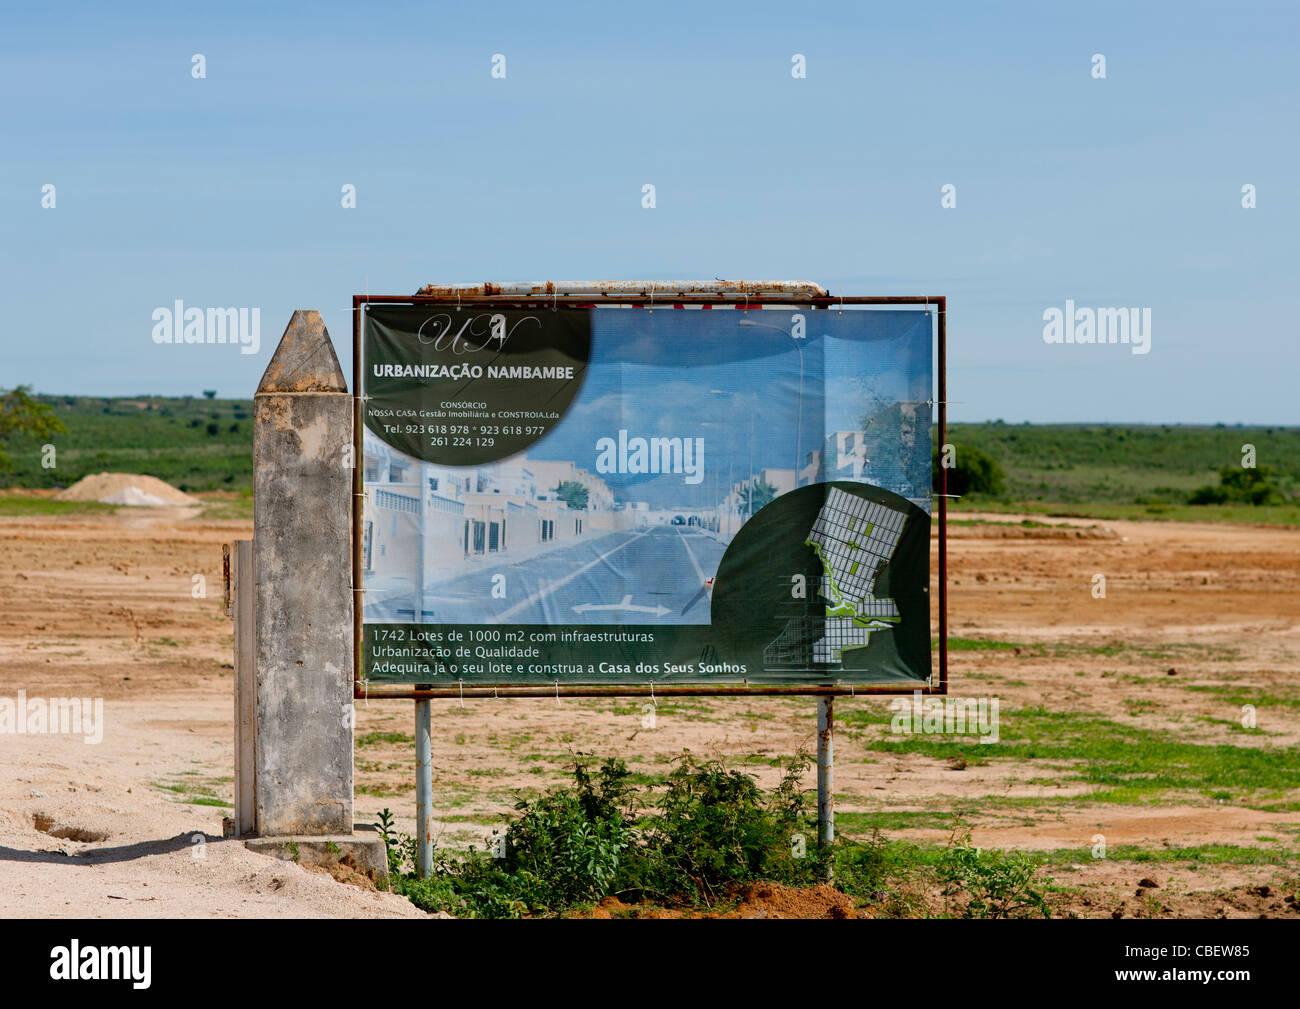 Property Development Project In Lubango, Angola - Stock Image